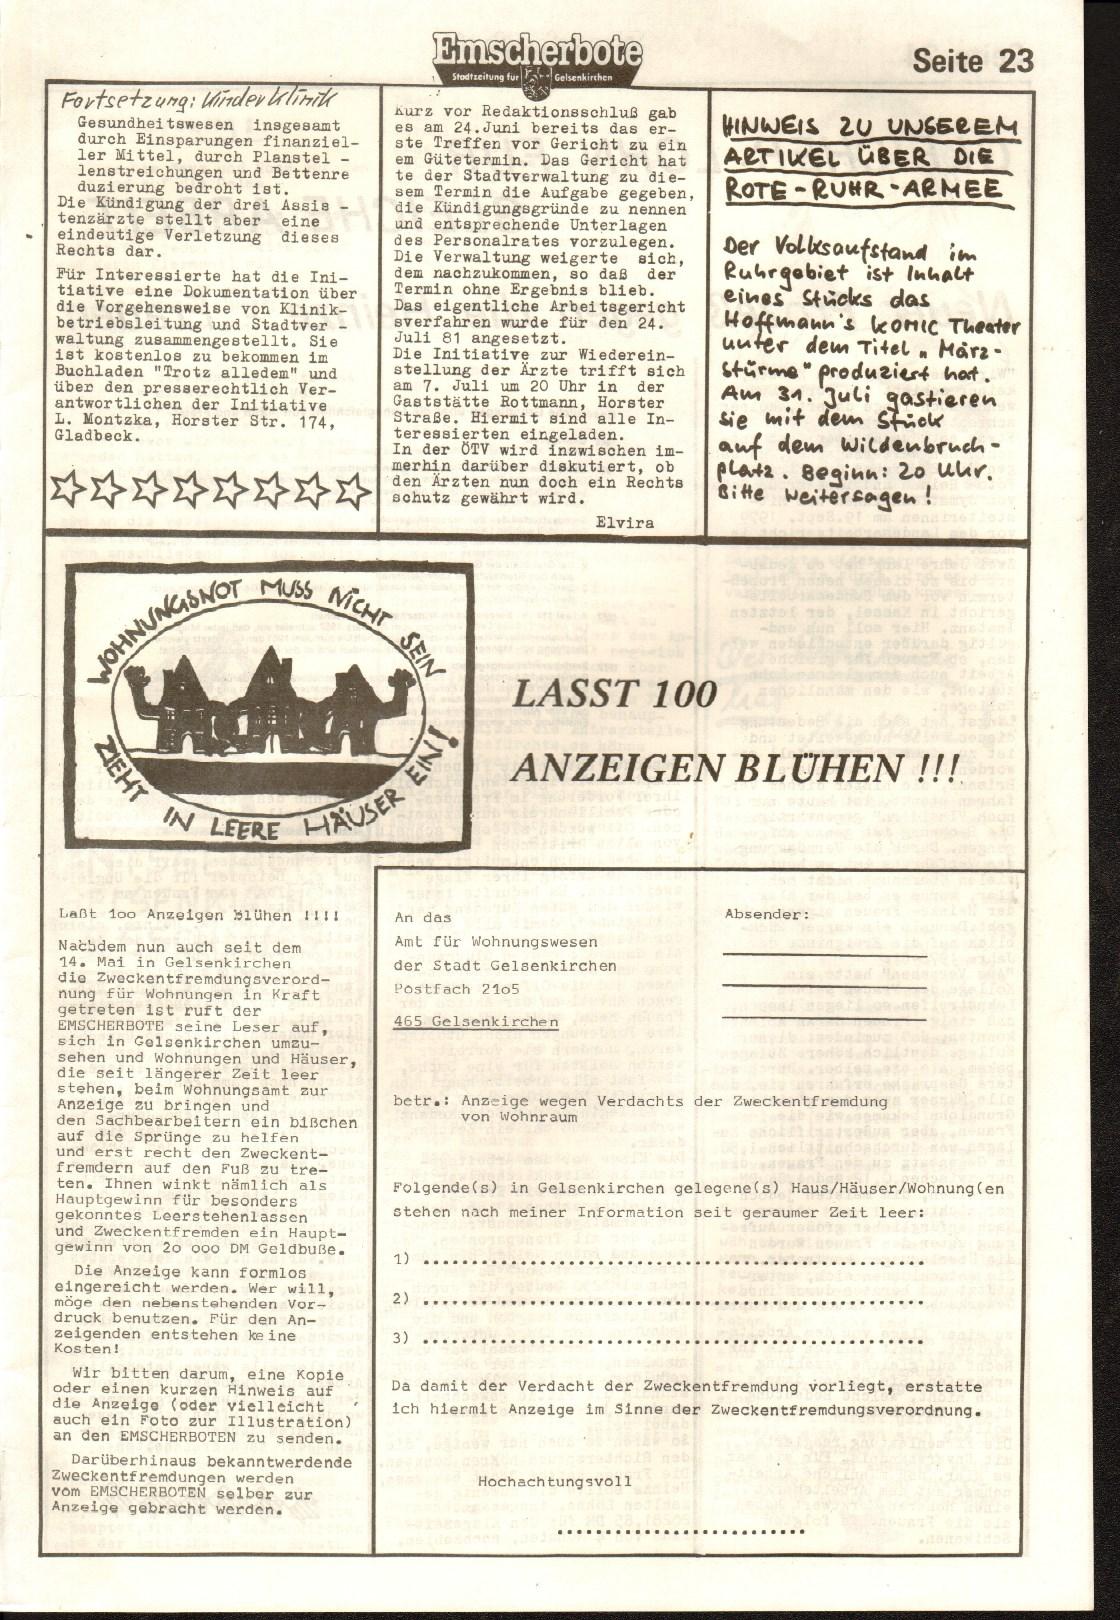 Gelsenkirchen_Emscherbote_1981_09_23